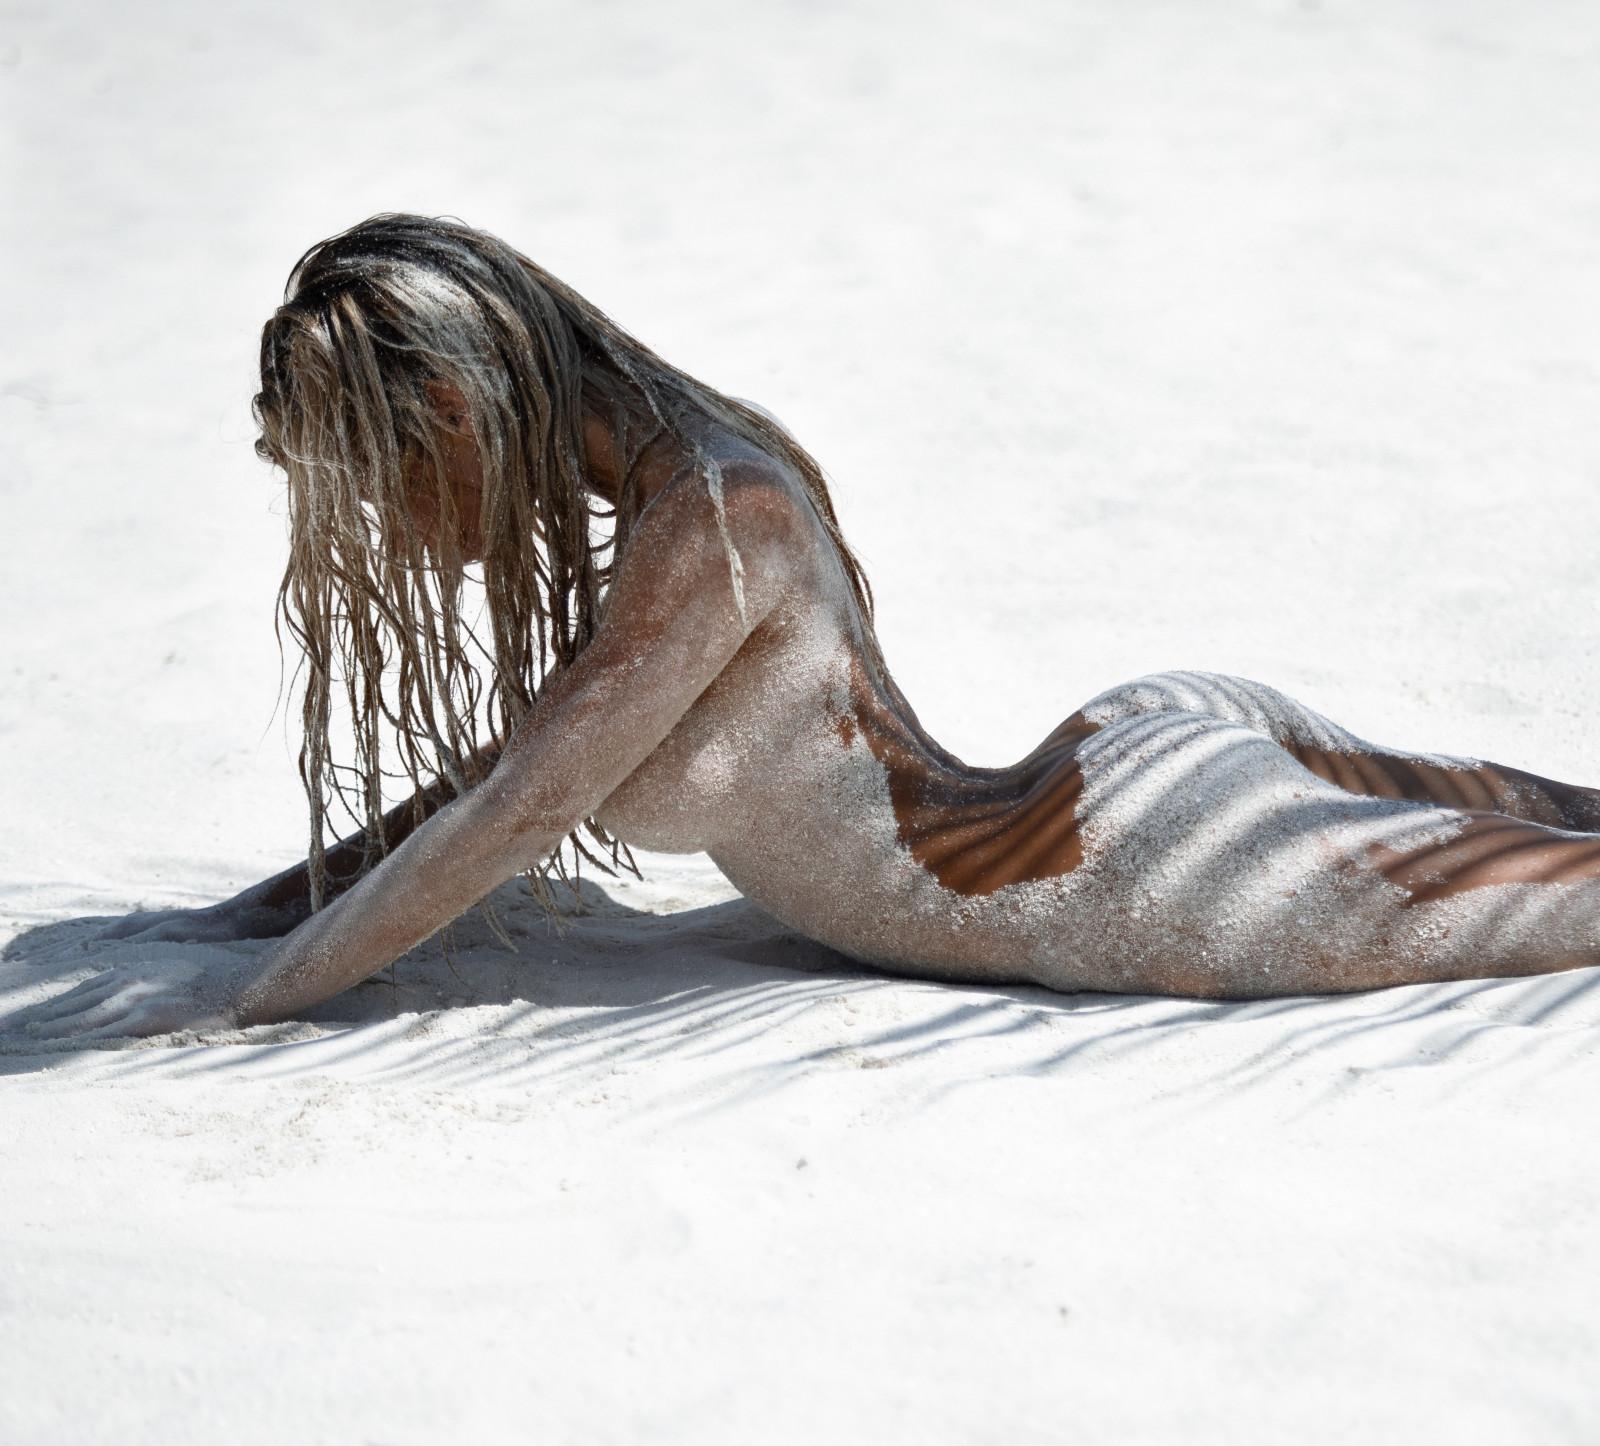 Wallpaper : Nata Lee, nude, beach 4319x3905 - nkym449 ...